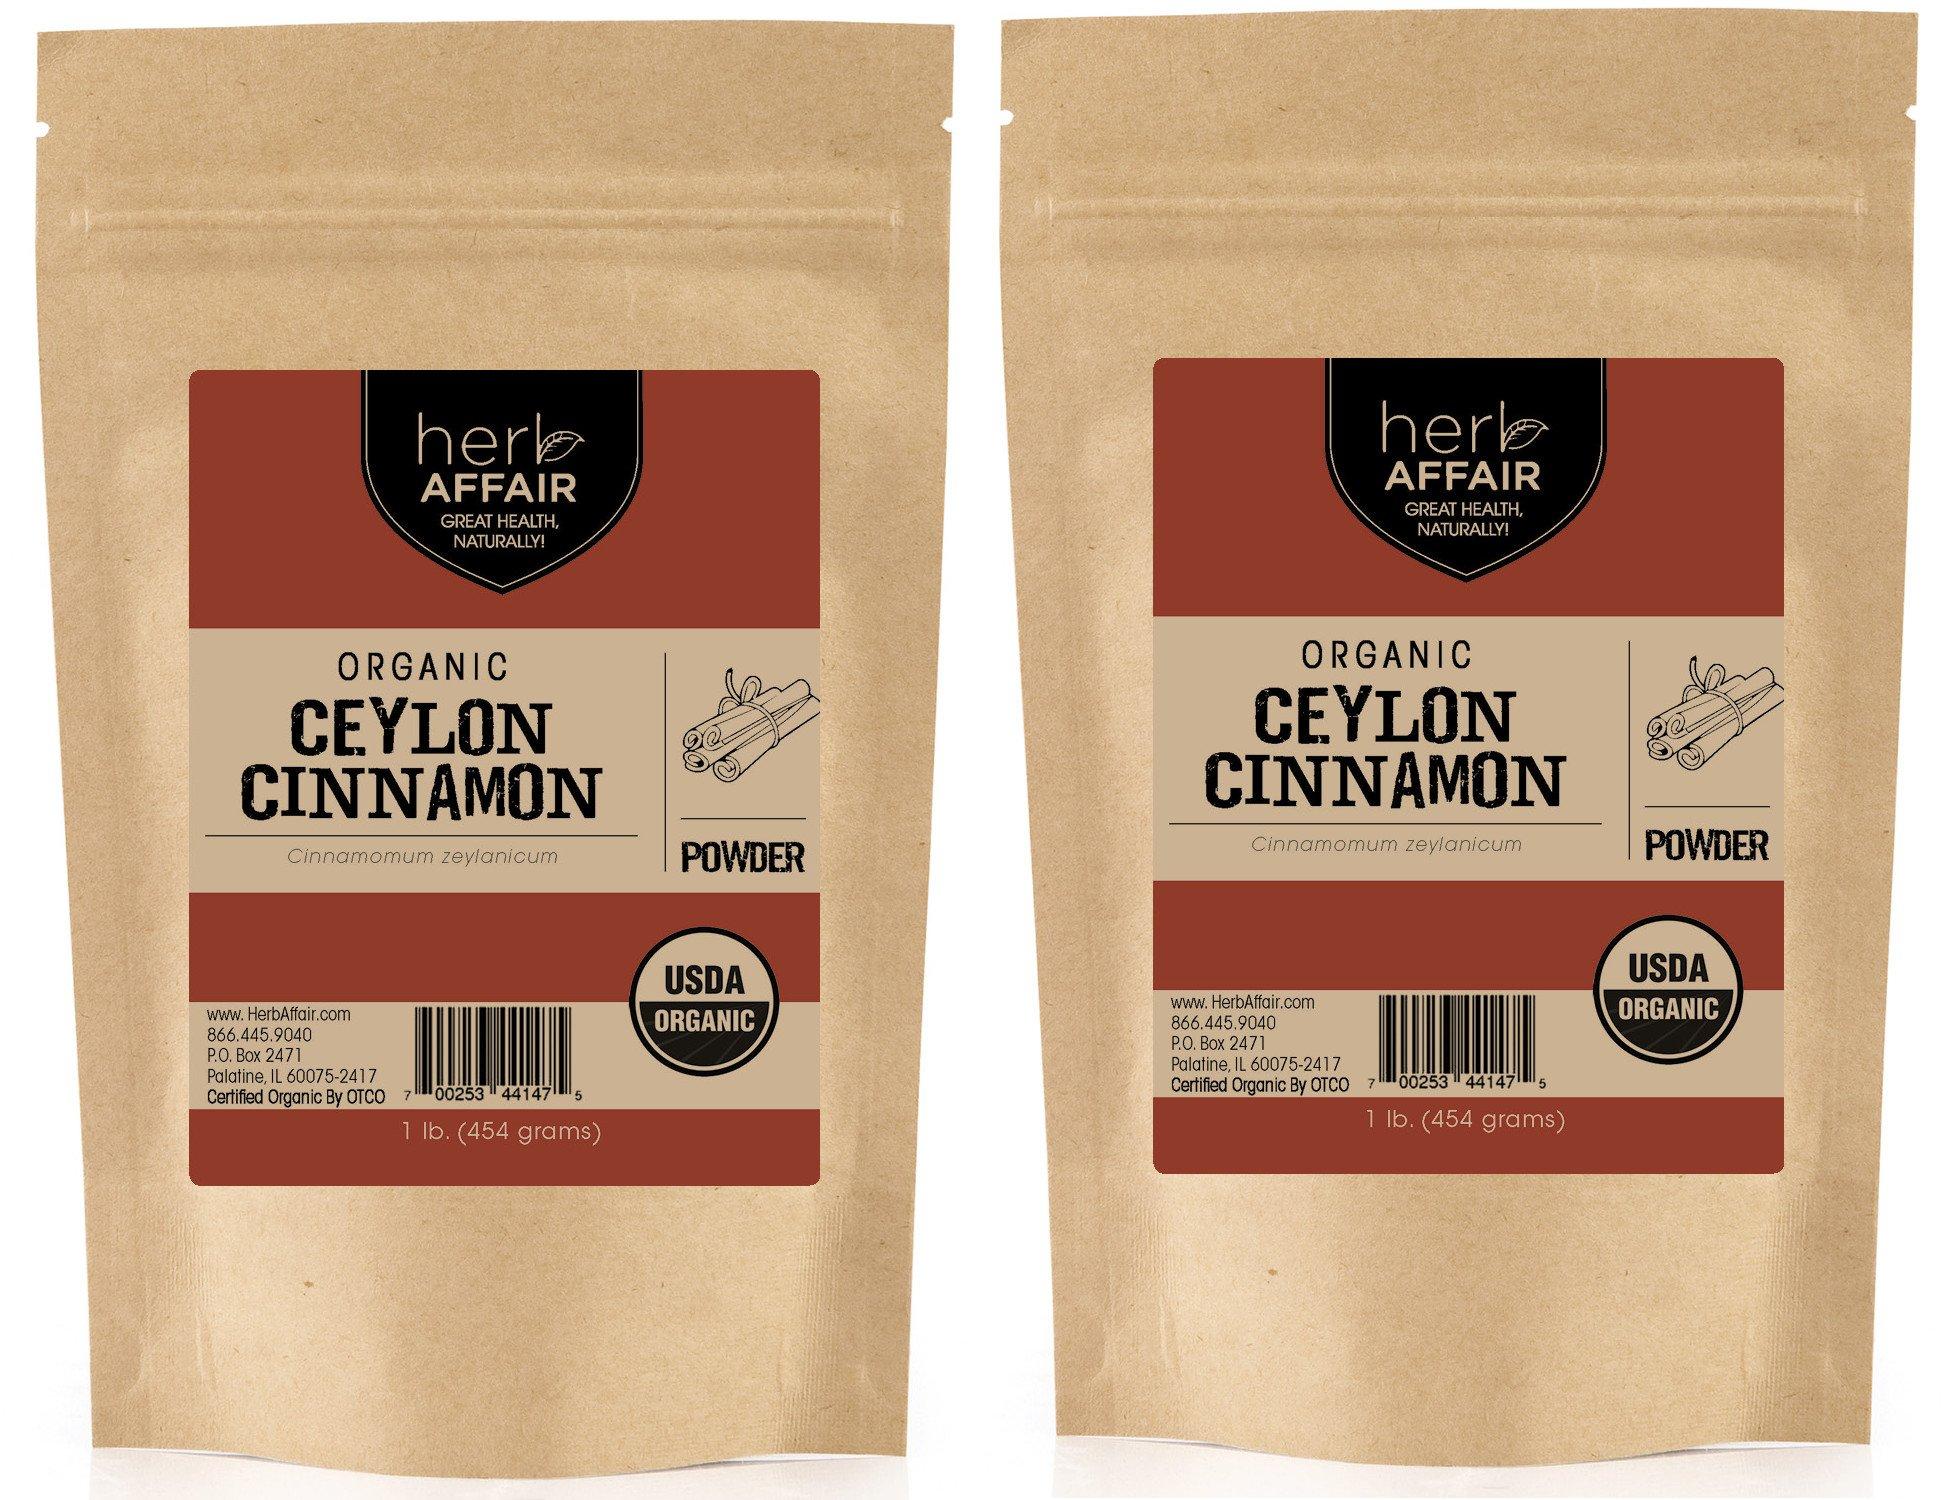 Herb Affair Organic Ceylon Cinnamon Powder, Freshly Ground, Referred to As True Cinnamon, Sweet, Delicate and Mild Flavor (2 lb. (2 1lb.))